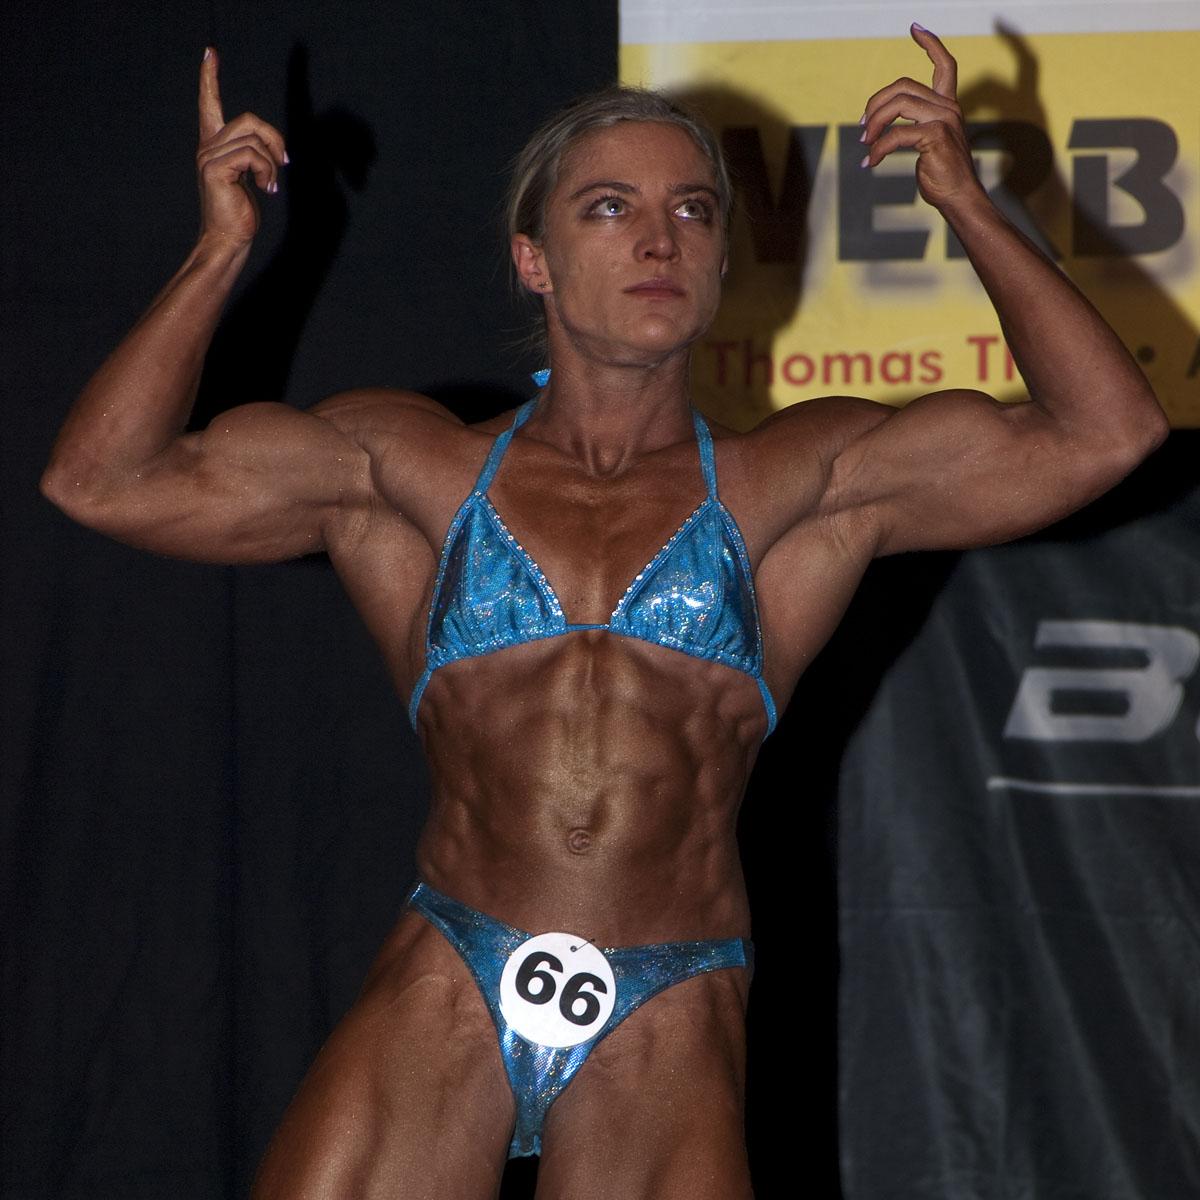 Tits national amateur bodybuilding association pra